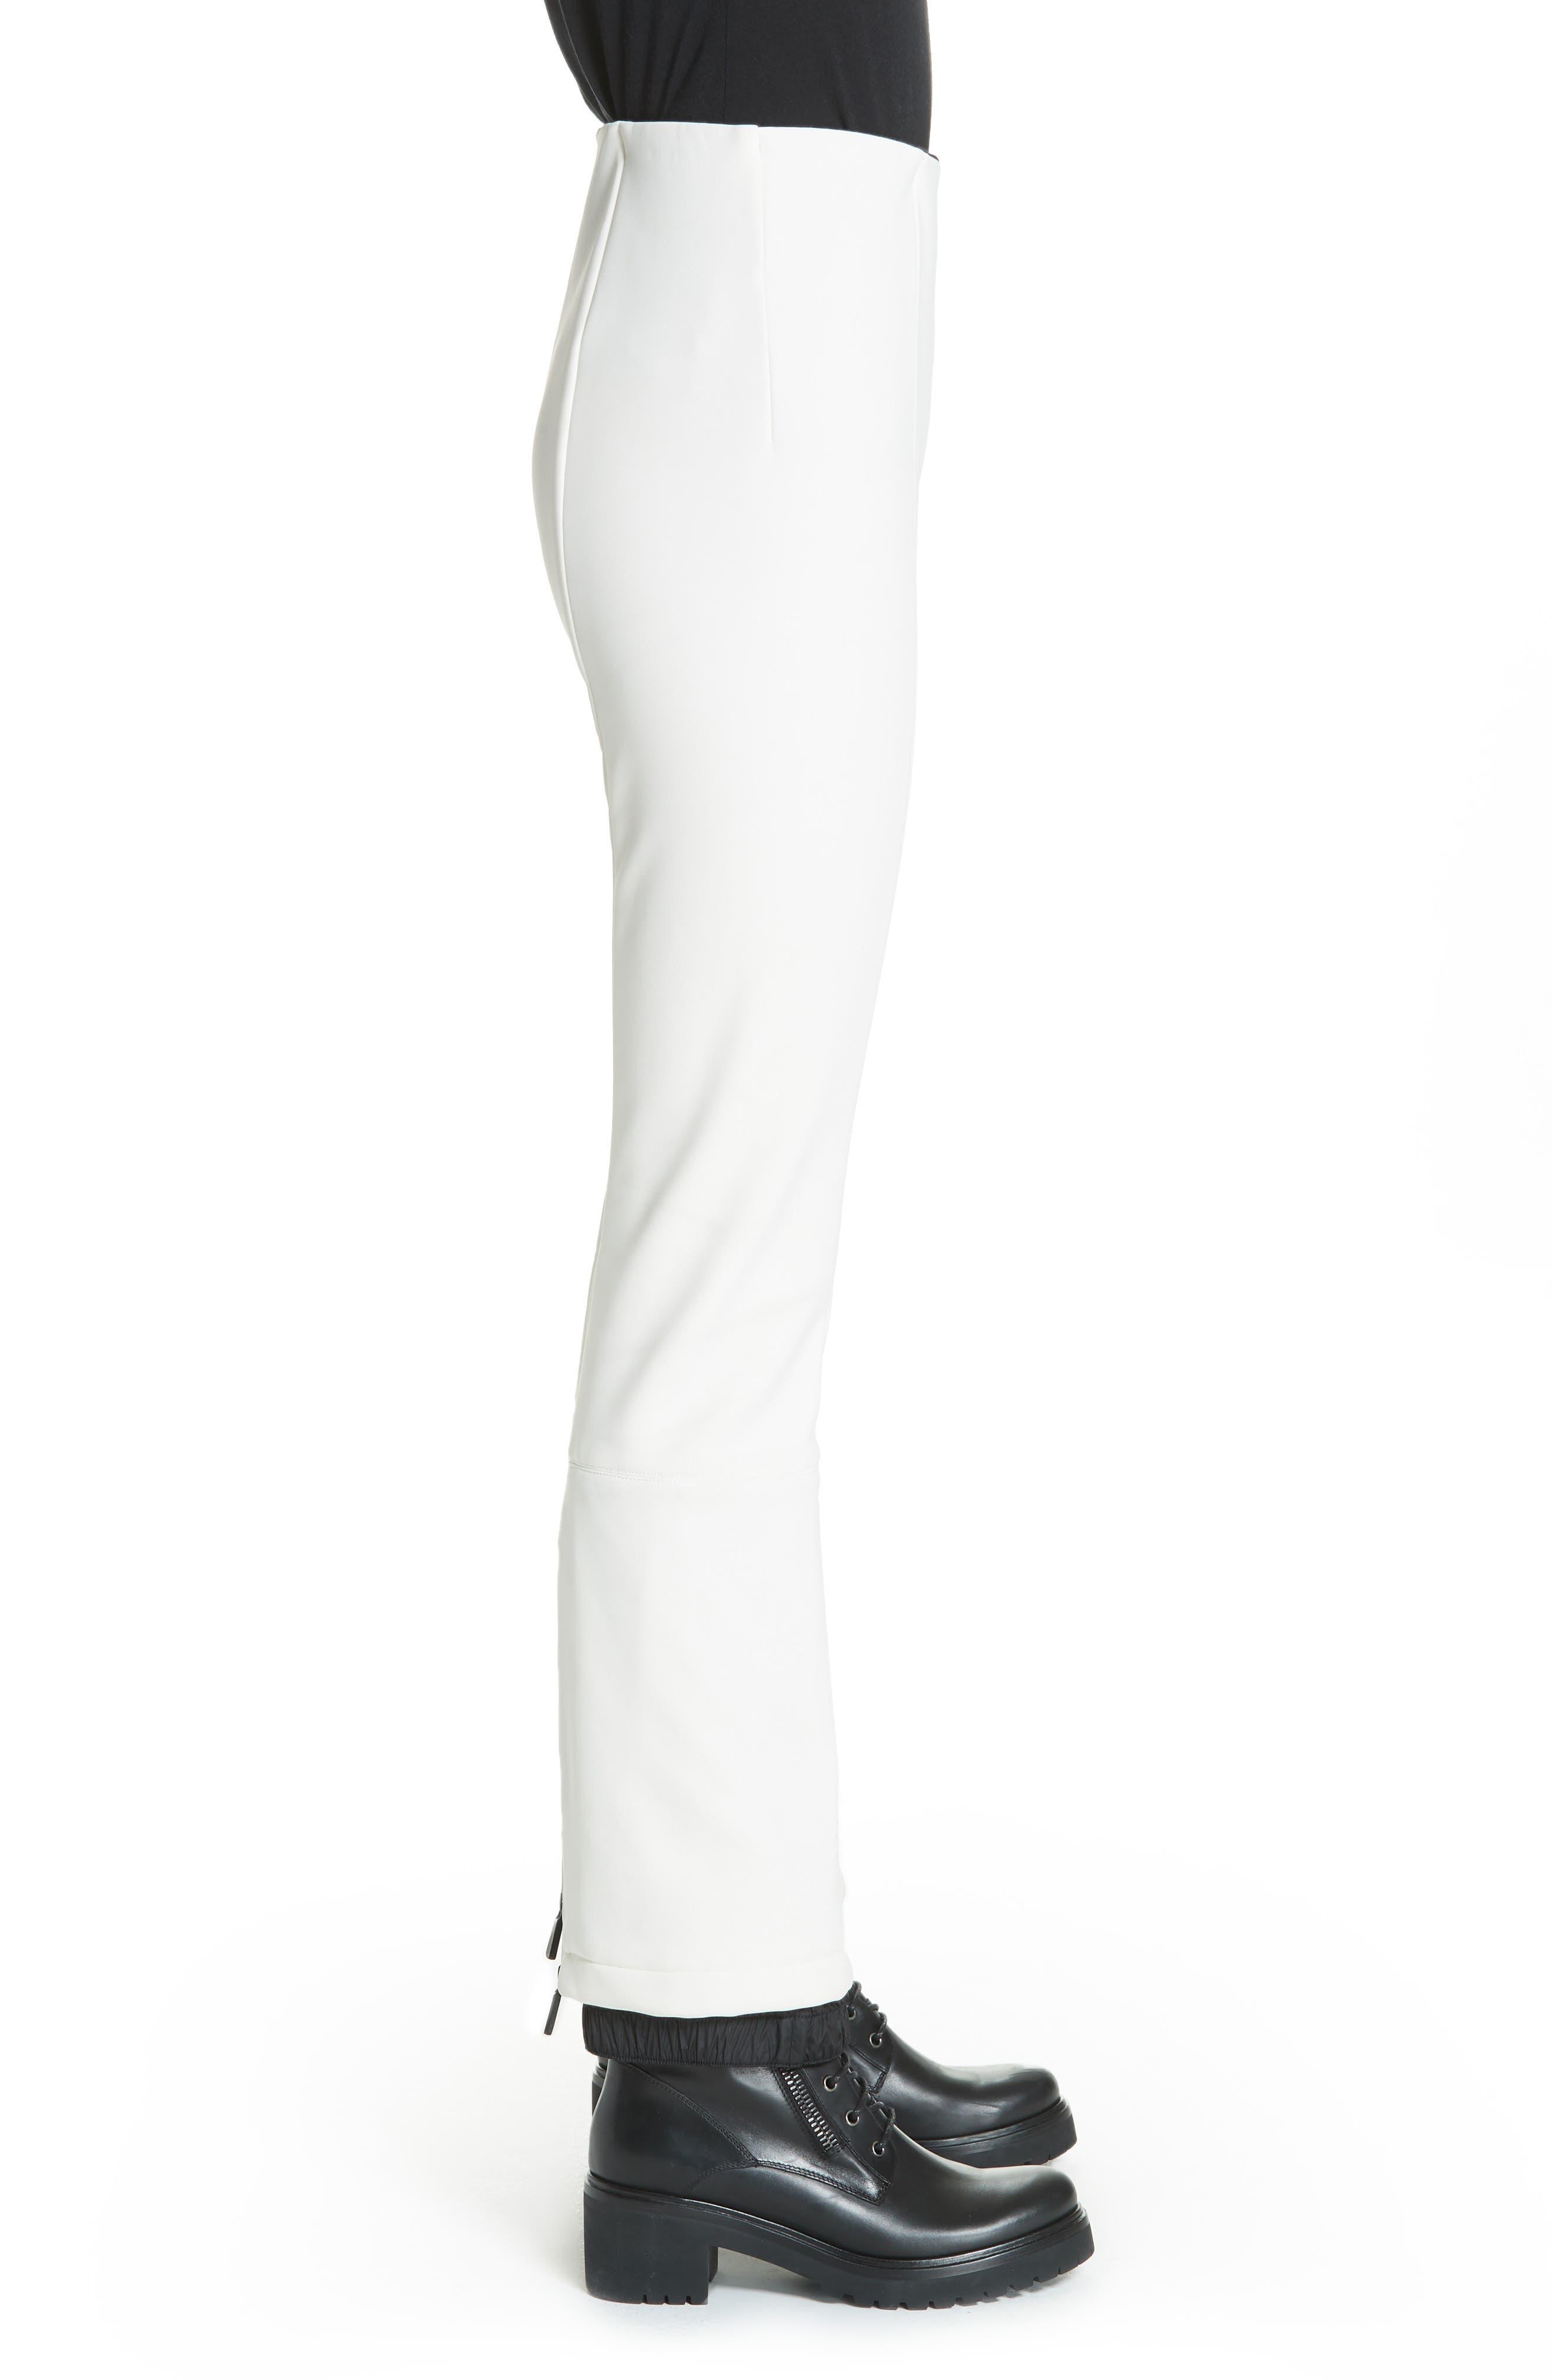 MONCLER, Skinny Stretch Ski Pants, Alternate thumbnail 3, color, WHITE